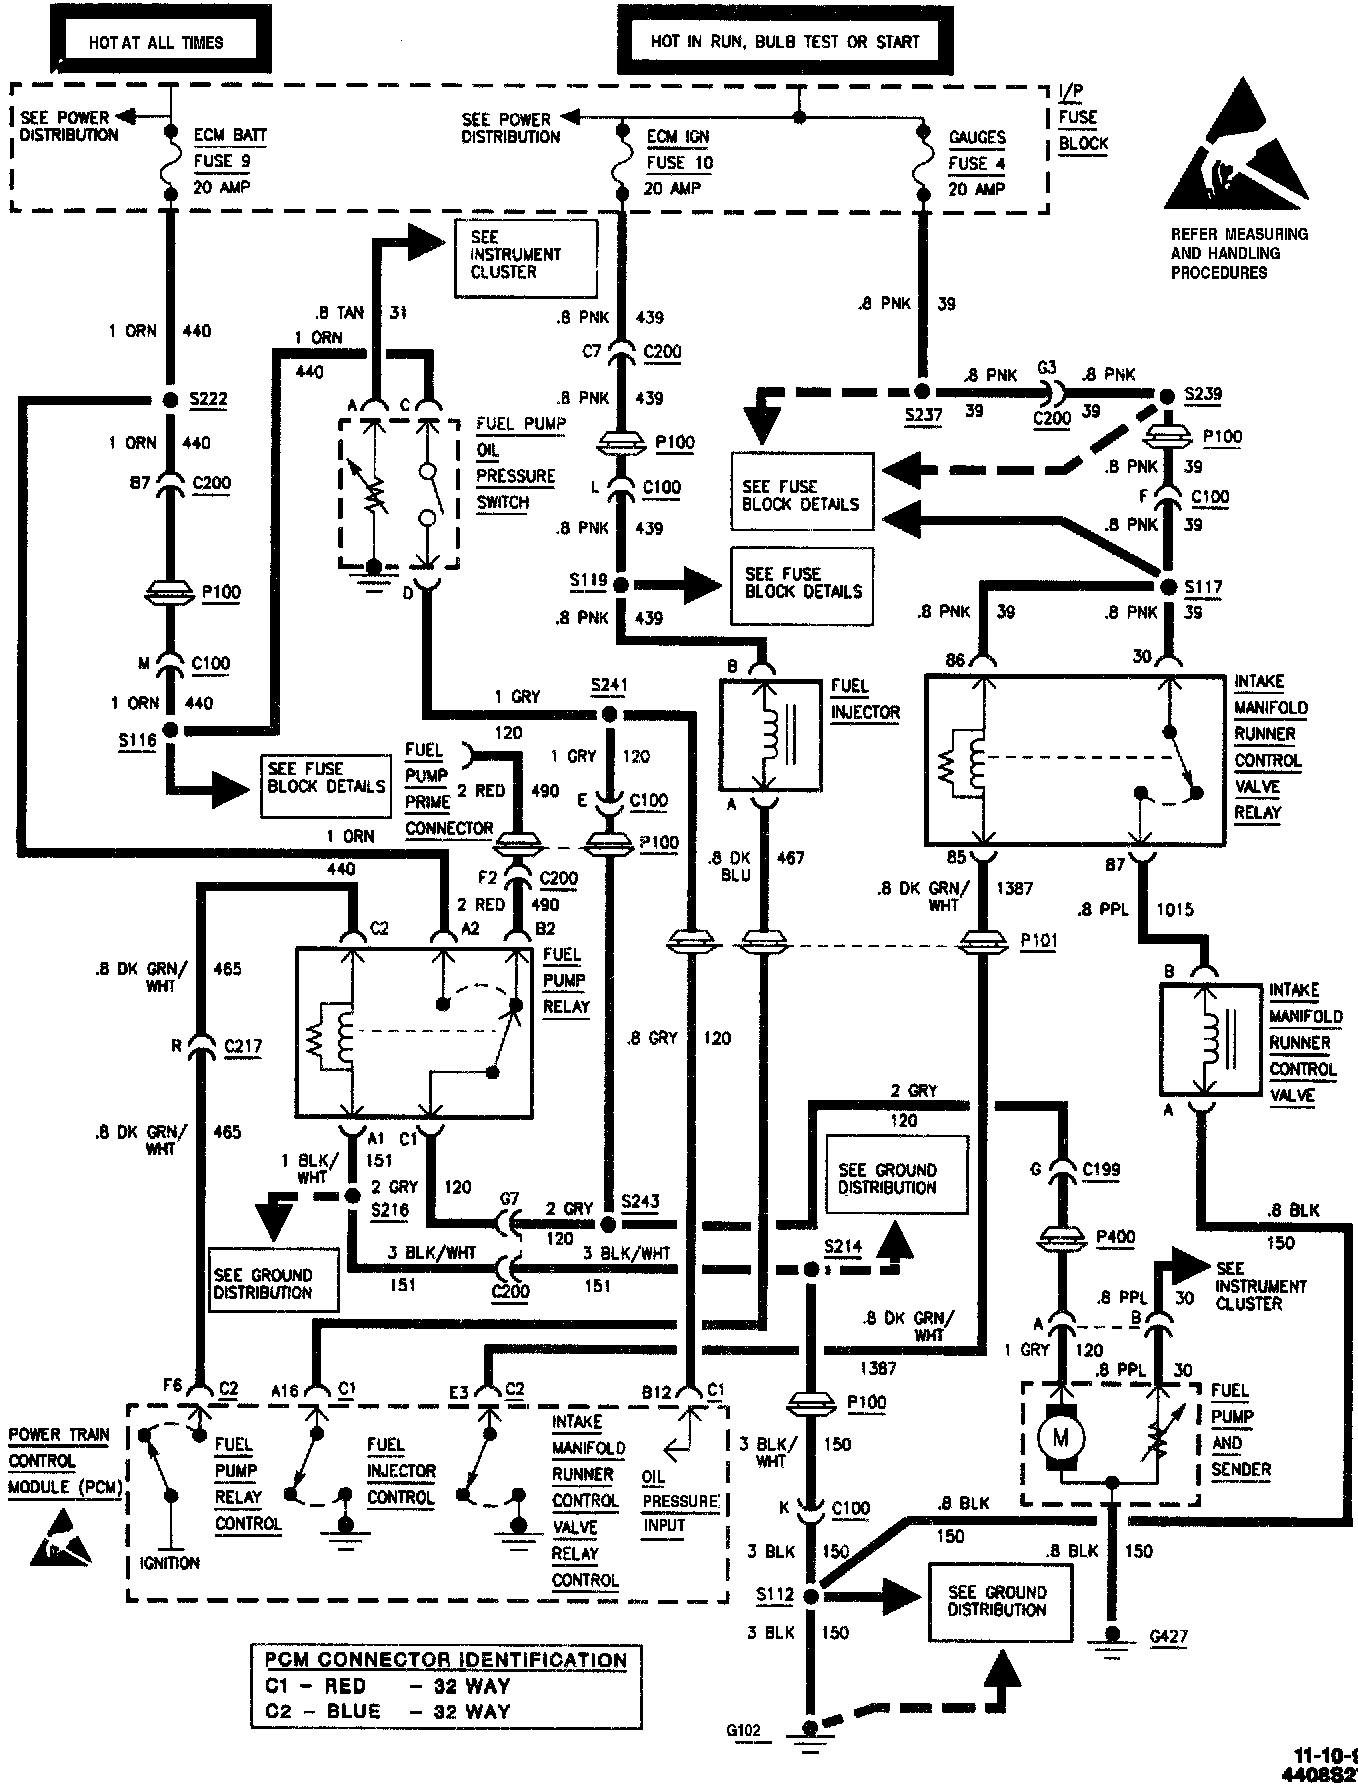 2005 tahoe ac diagram auto electrical wiring diagram2005 tahoe ac diagram